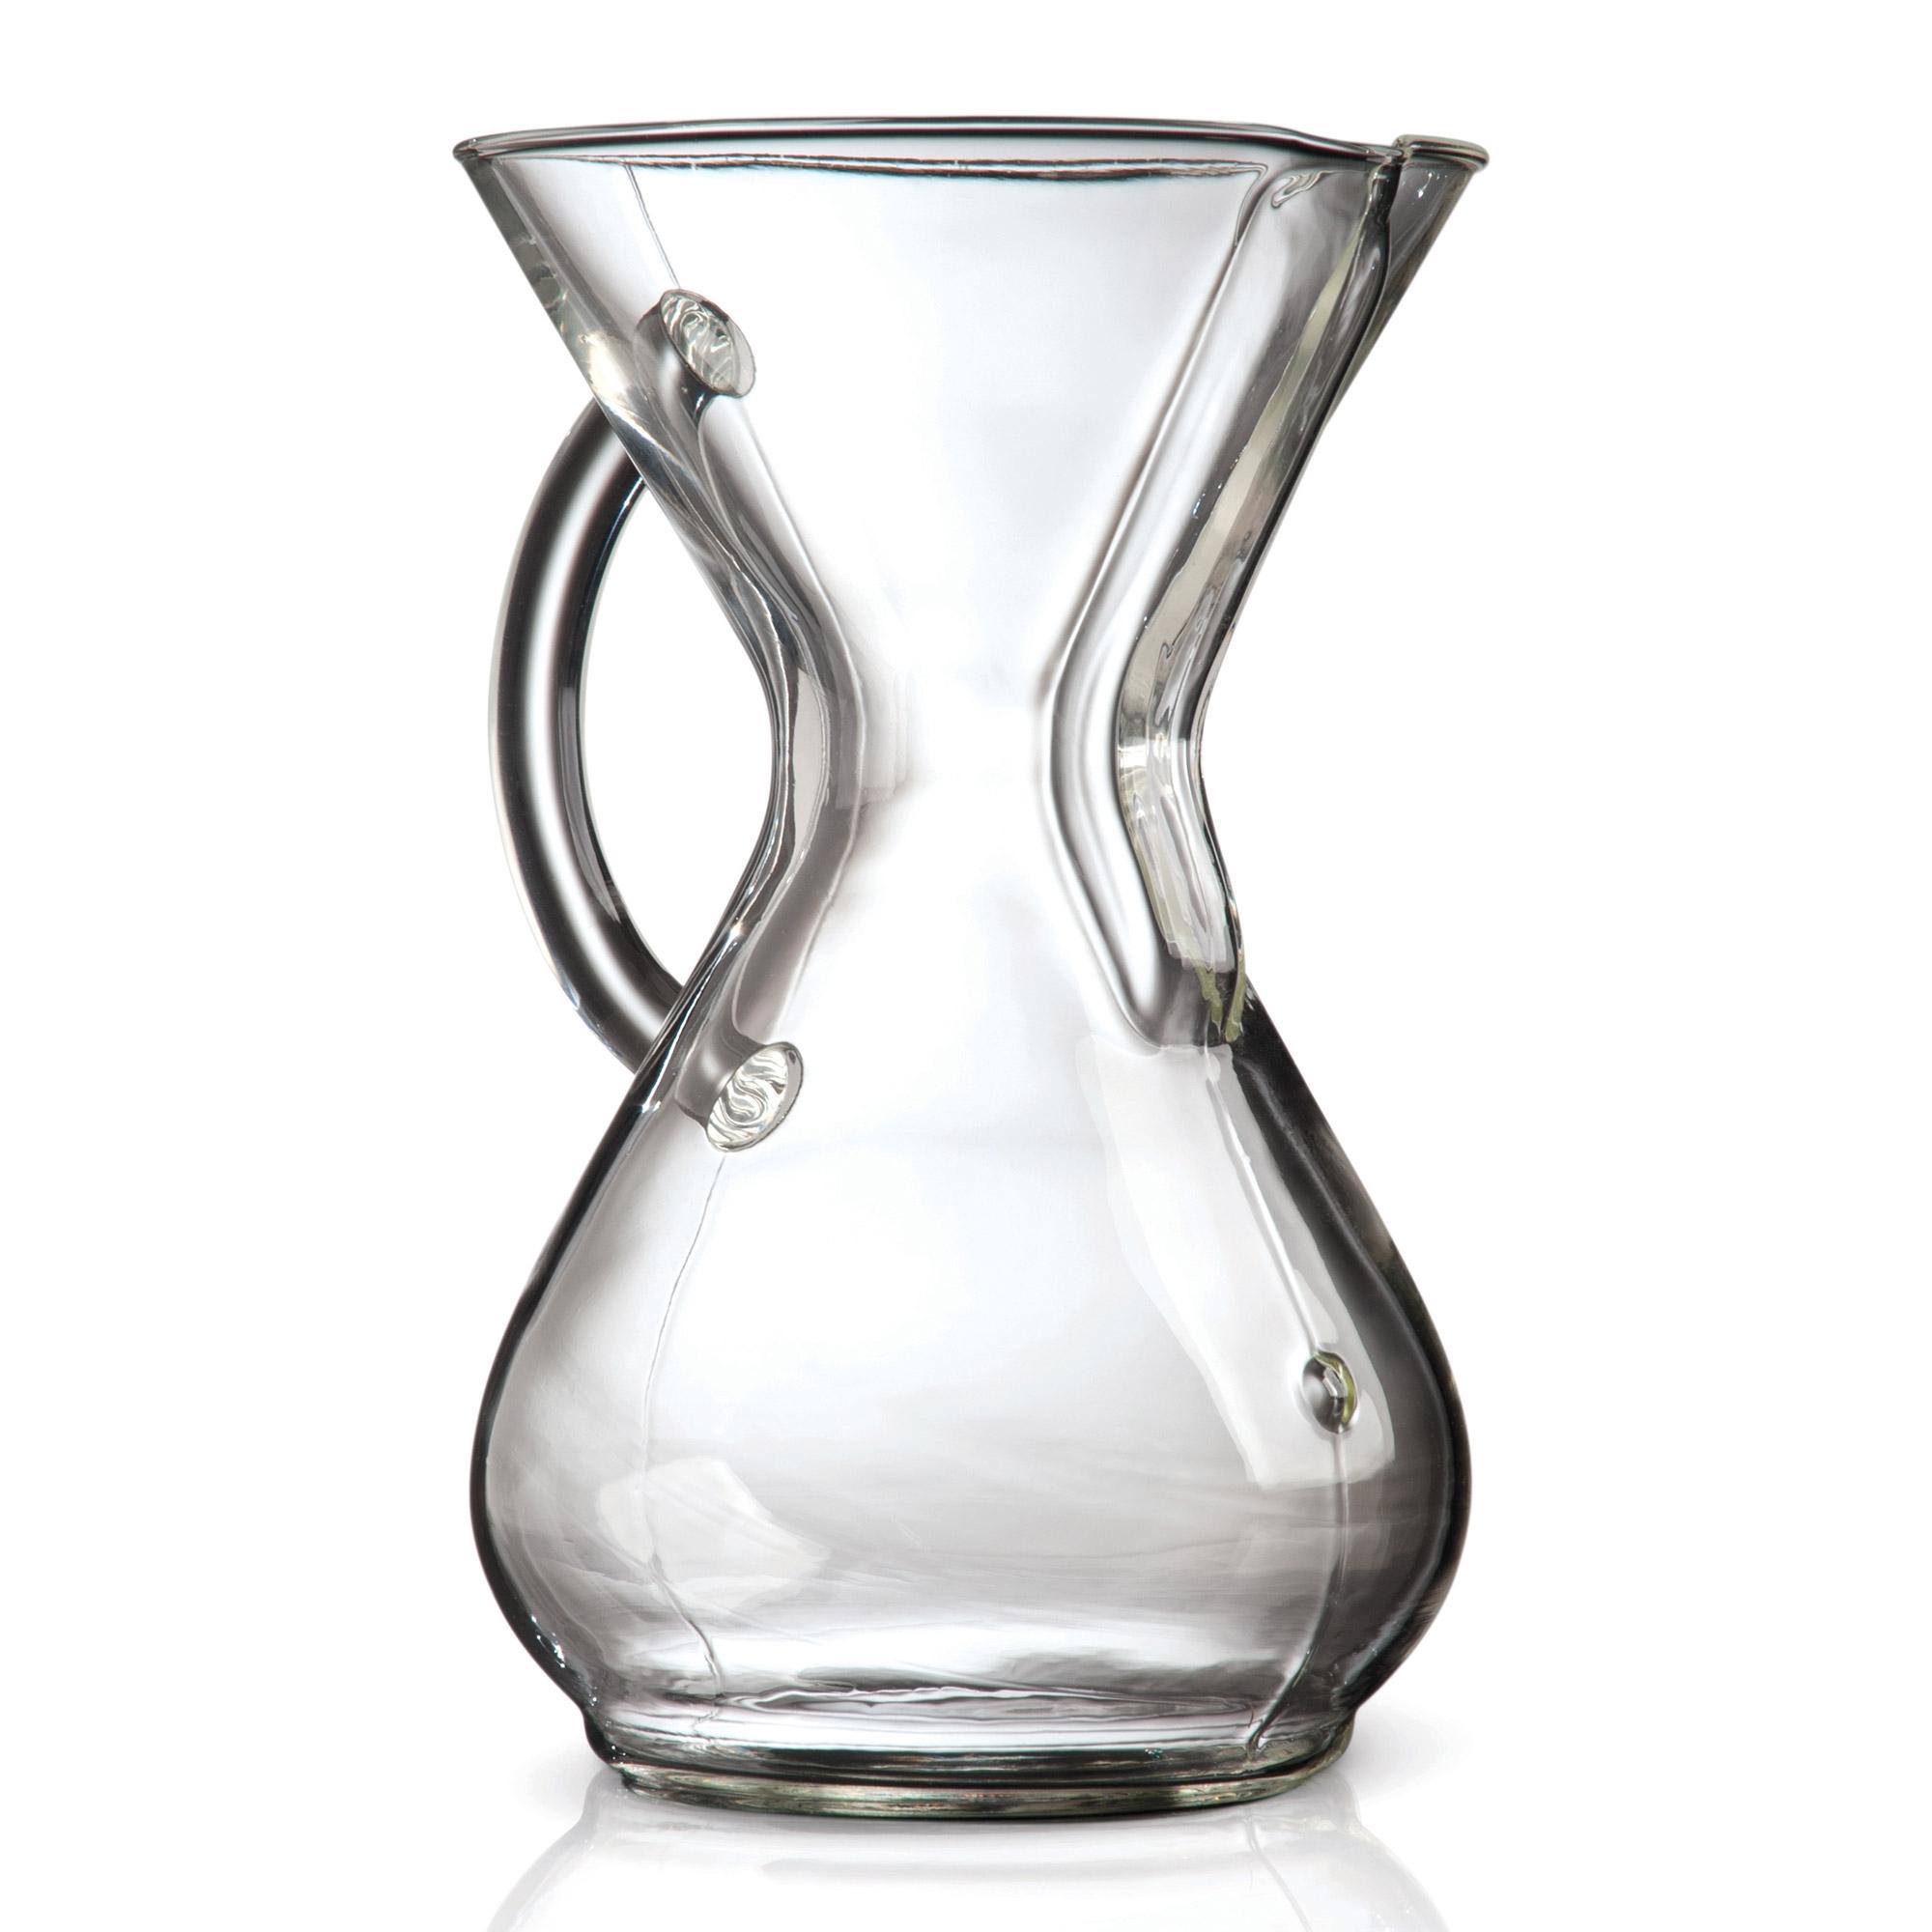 CHEMEX Glass Handle 6 Cup